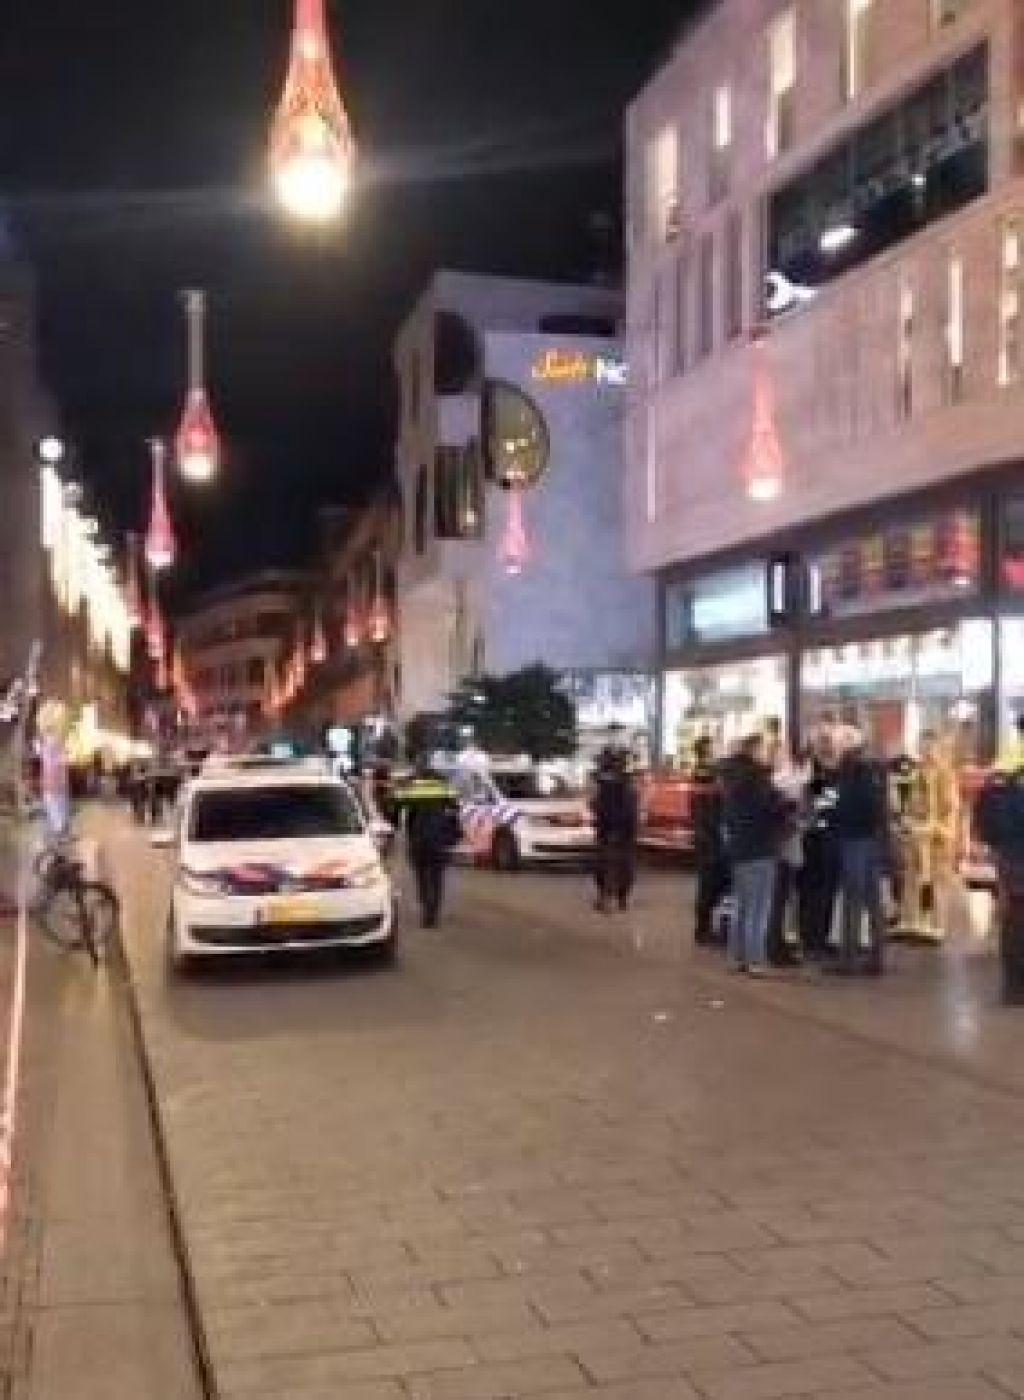 Nizozemska policija aretirala osumljenca za napad z nožem v Haagu